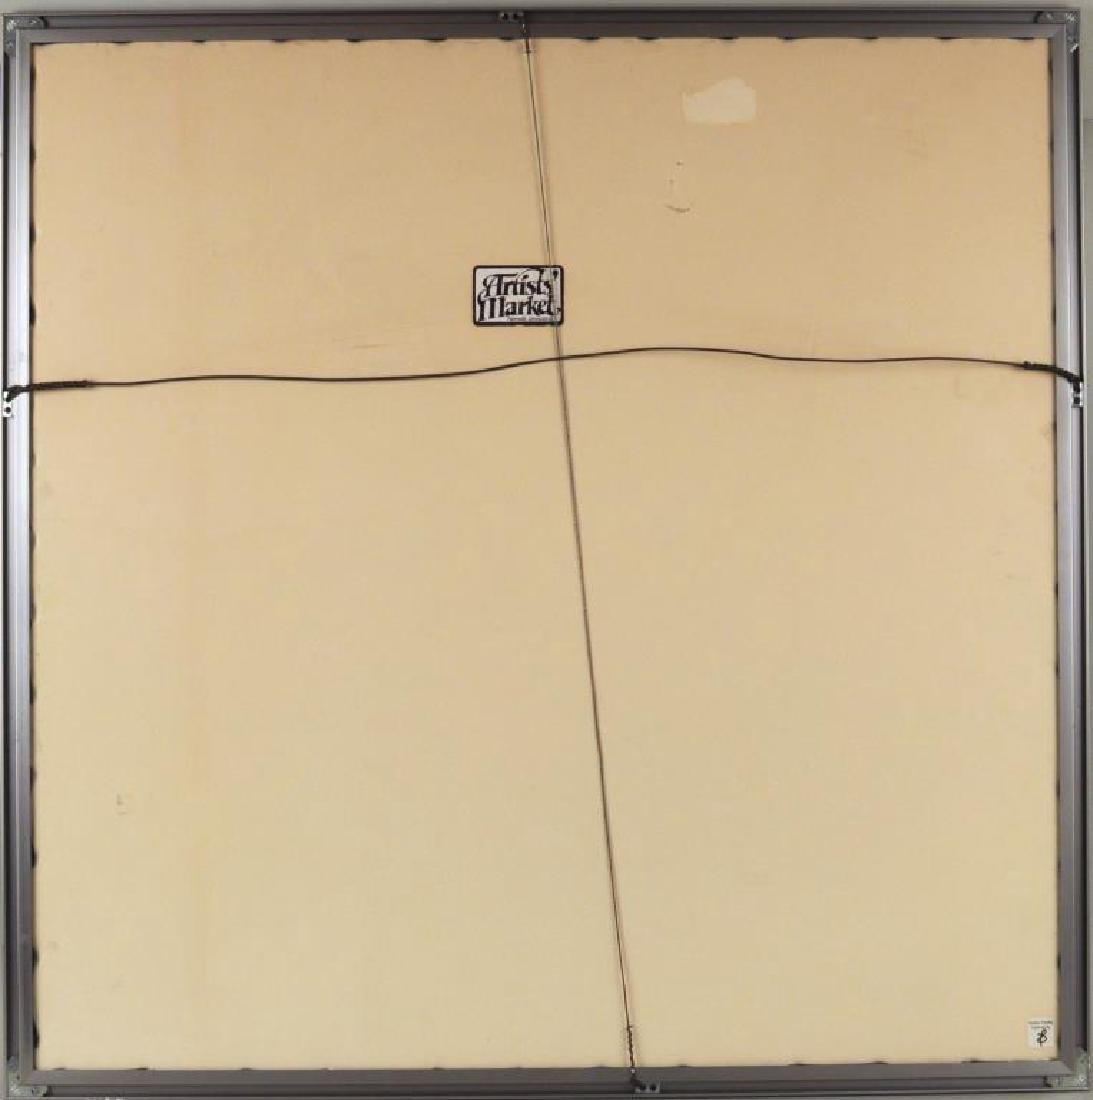 "Charles DeLong ""2 1/2"" Square"" Lithograph - 4"